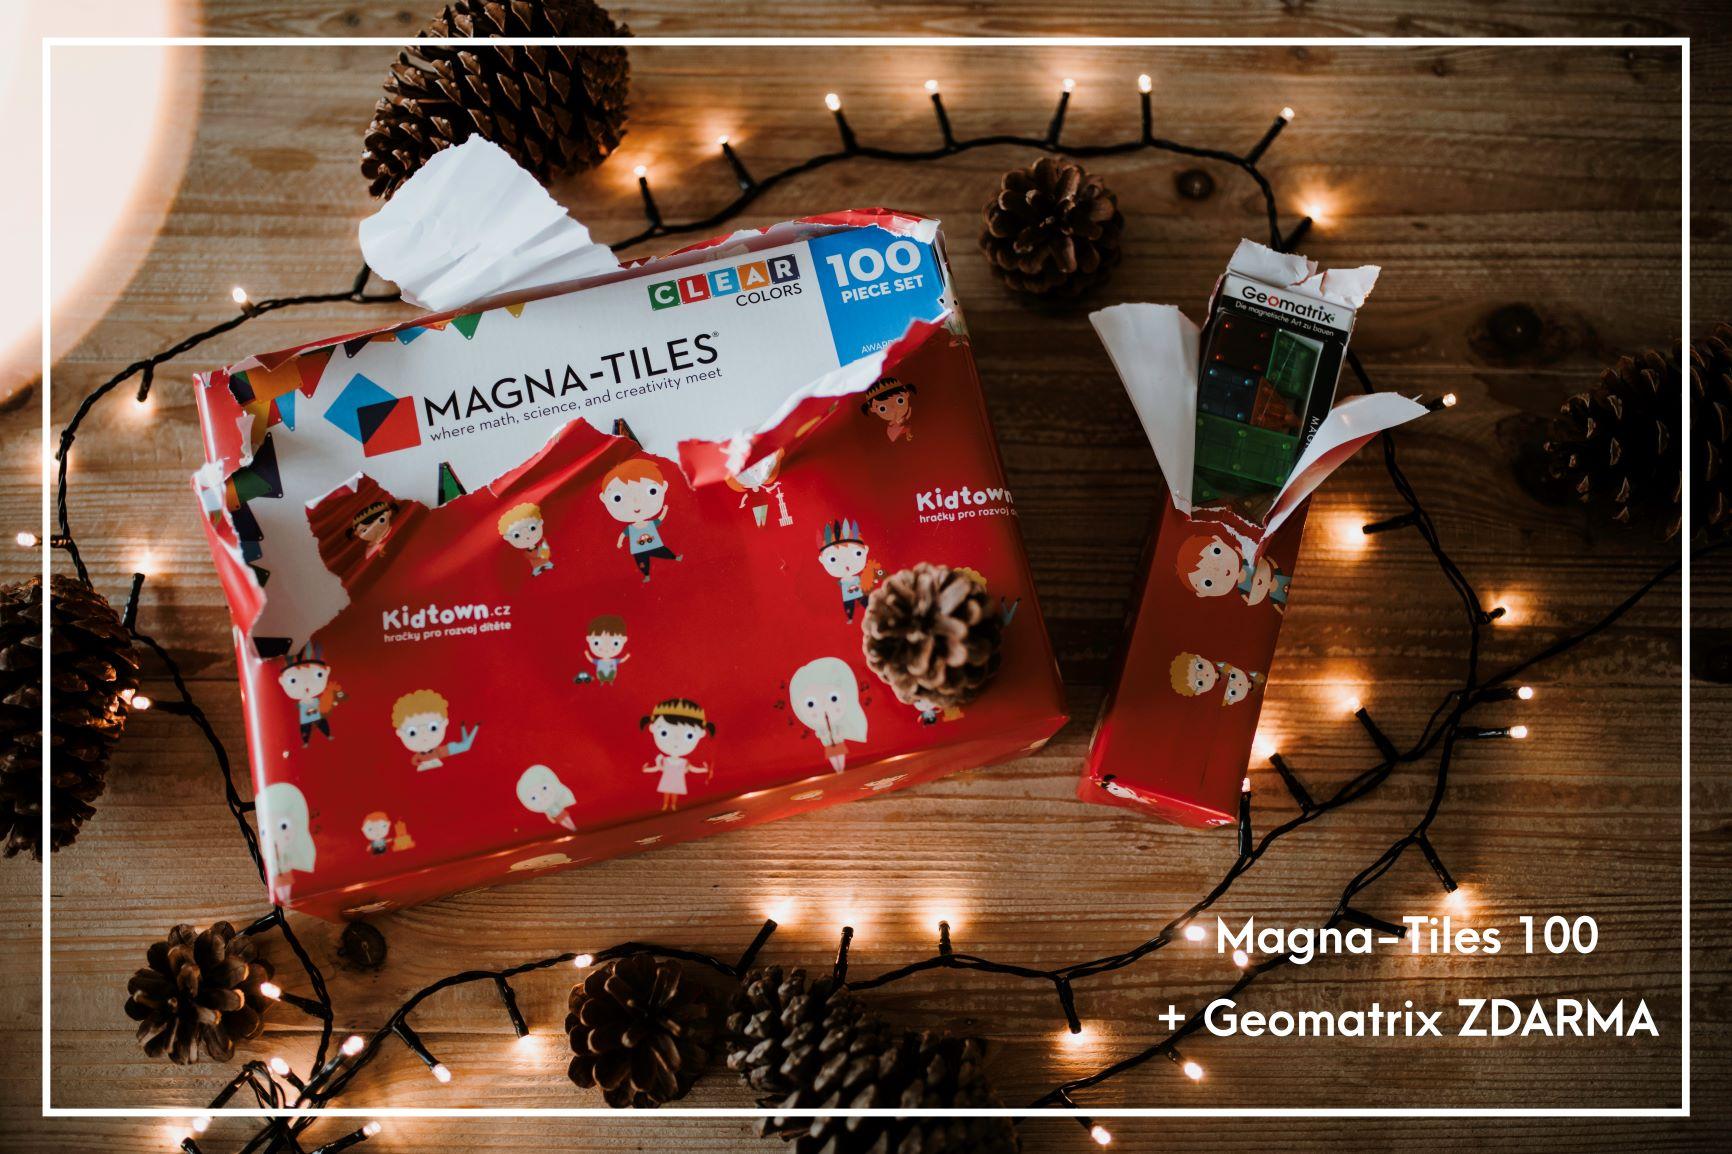 magnailes100-geomatrix-zdarma